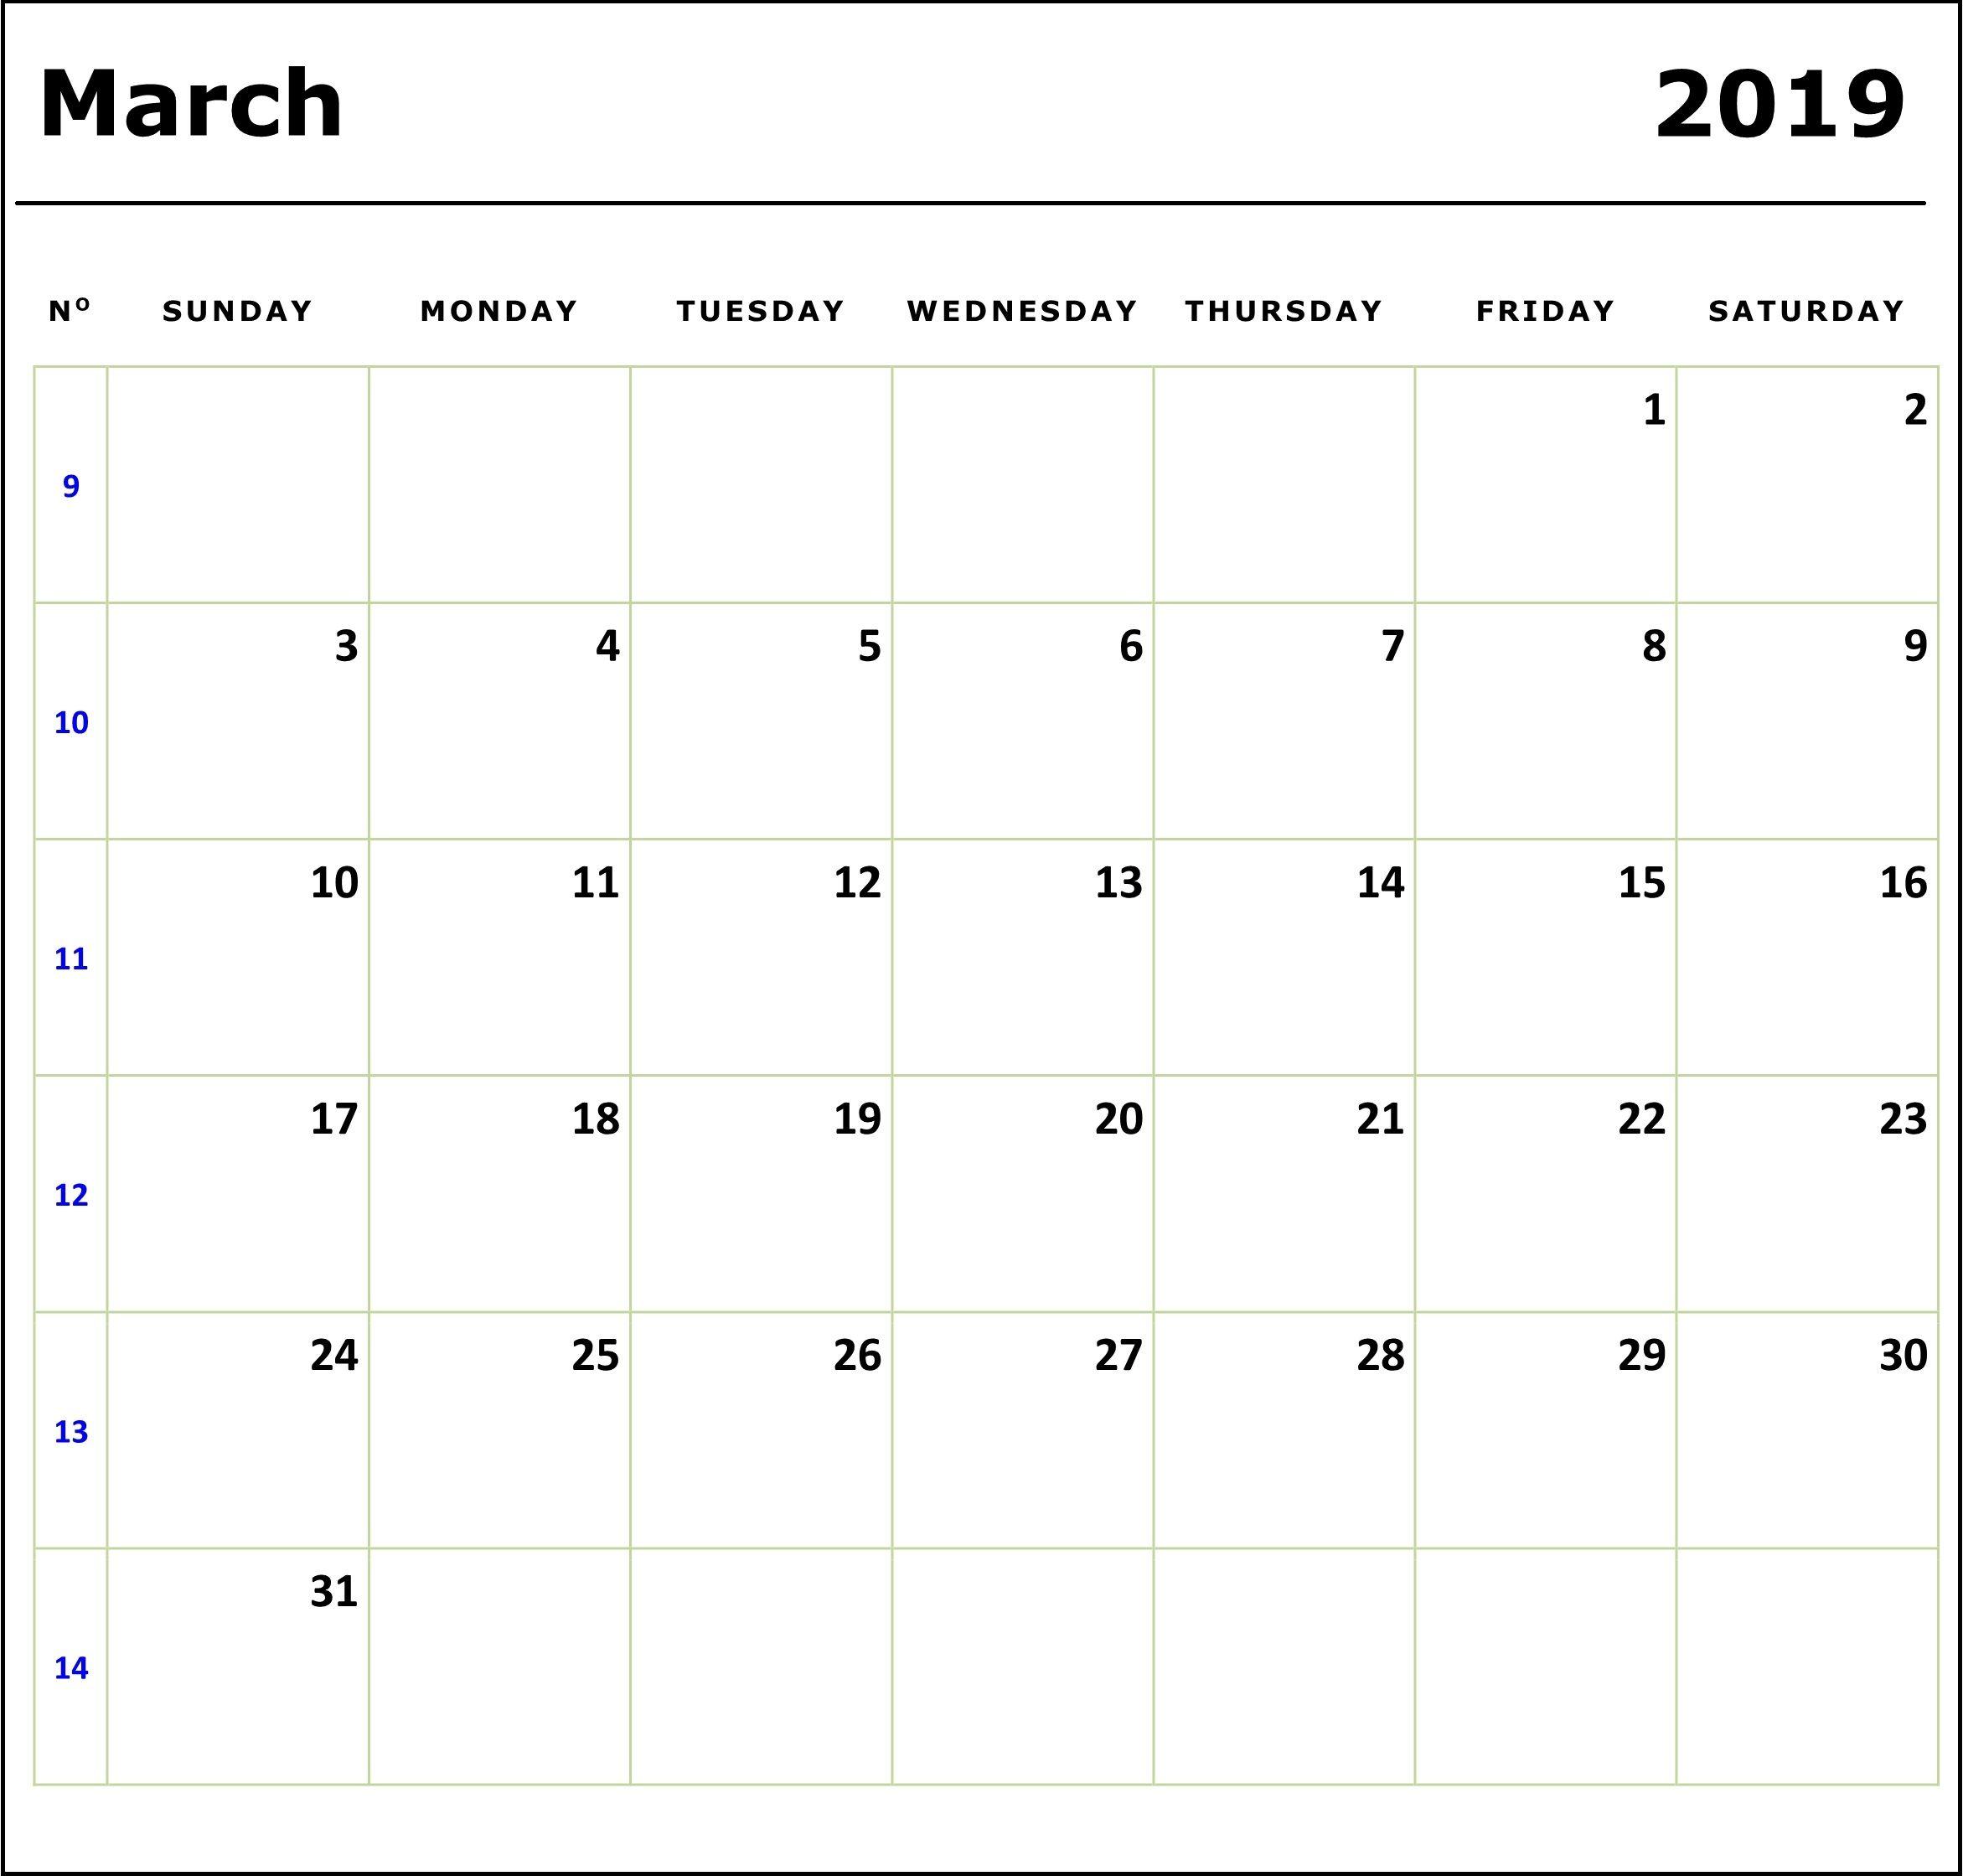 Printable March 2019 Holidays Calendar March2019calendar